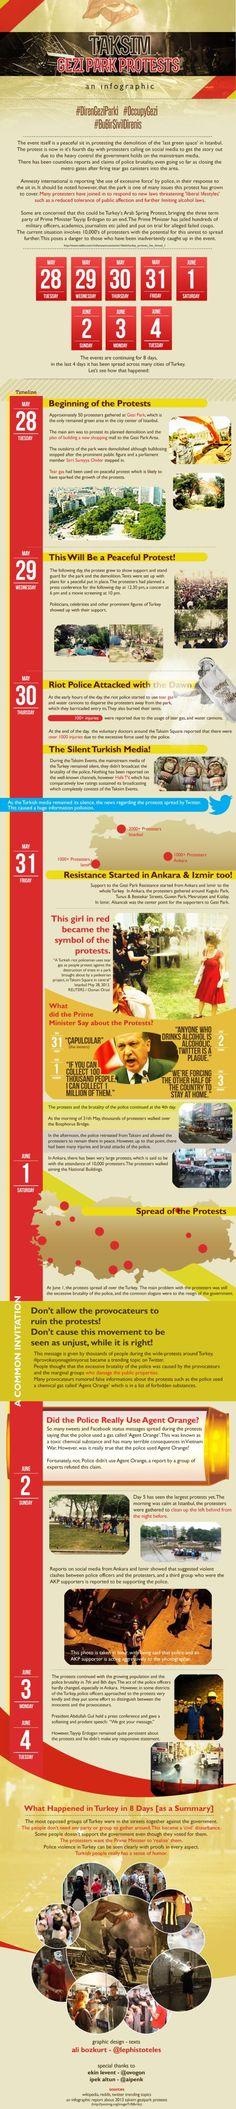 What's happening in Turkey? Taksim Gezi Park Protest #OccupyGezi #BuBirSivilDirenis #DirenGeziParki